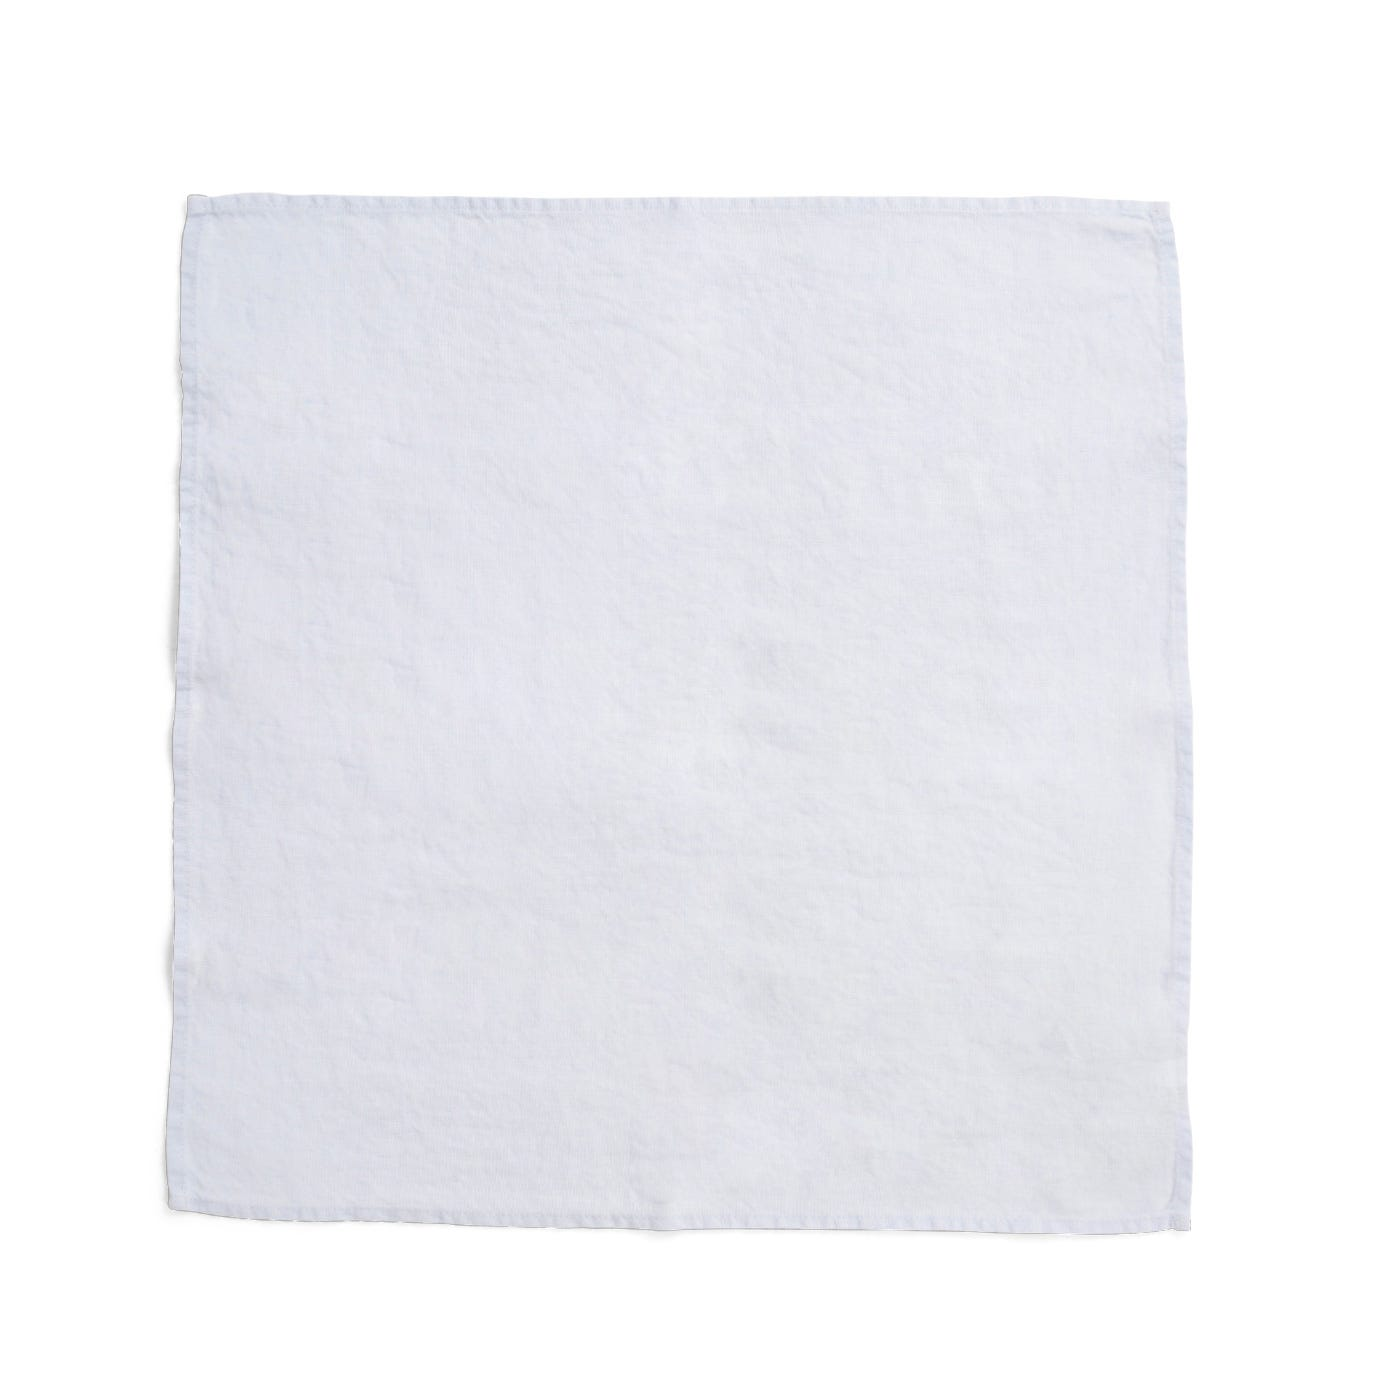 Heal's Linen Napkin Powder Blue